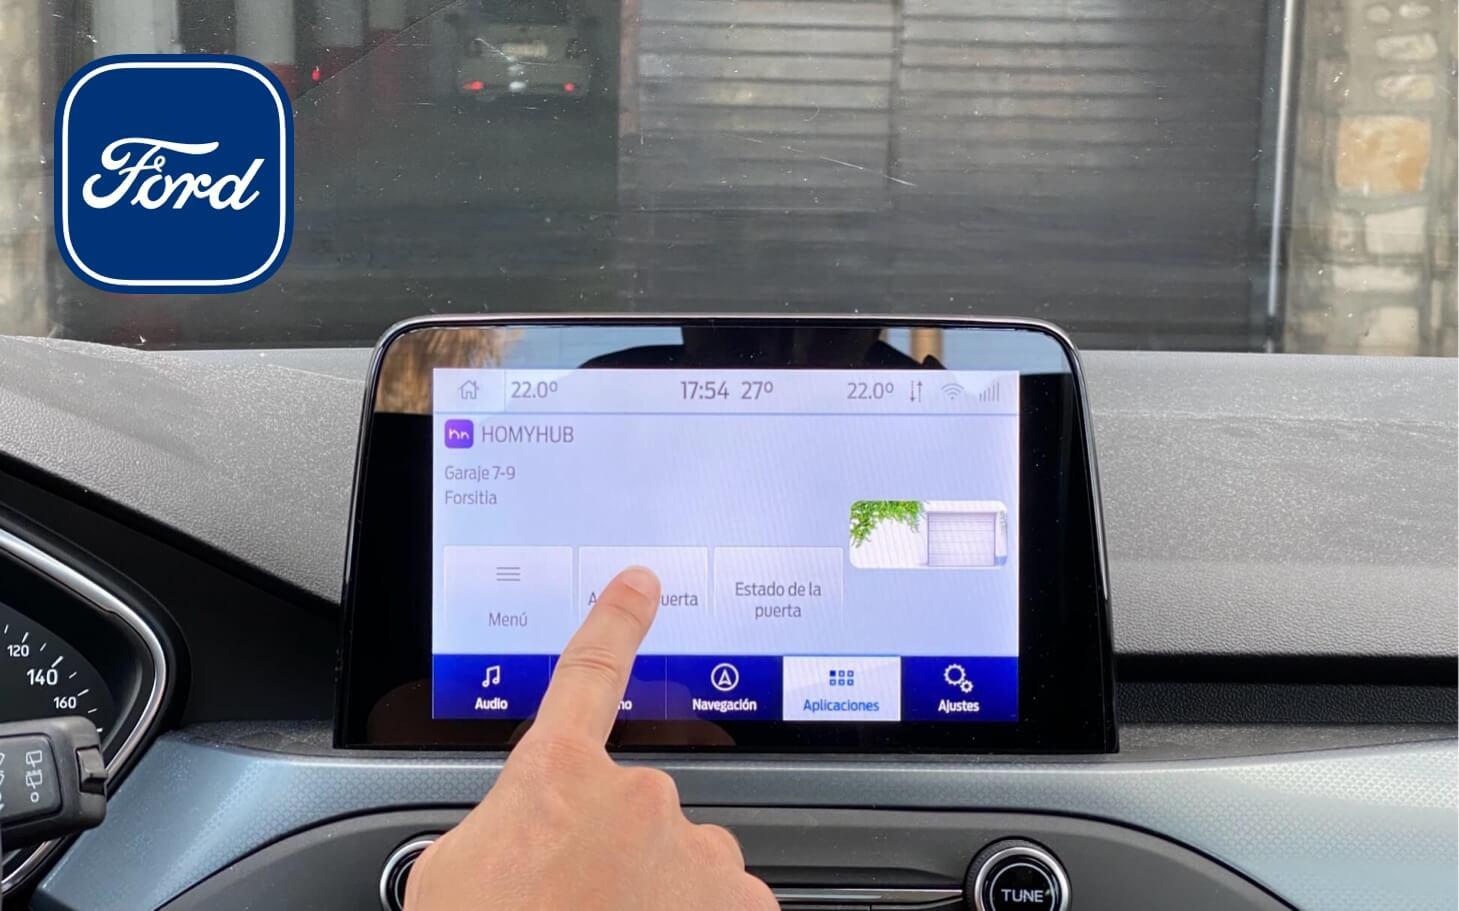 HOMYHUB App Garaje Ford AppLink SYNC coche